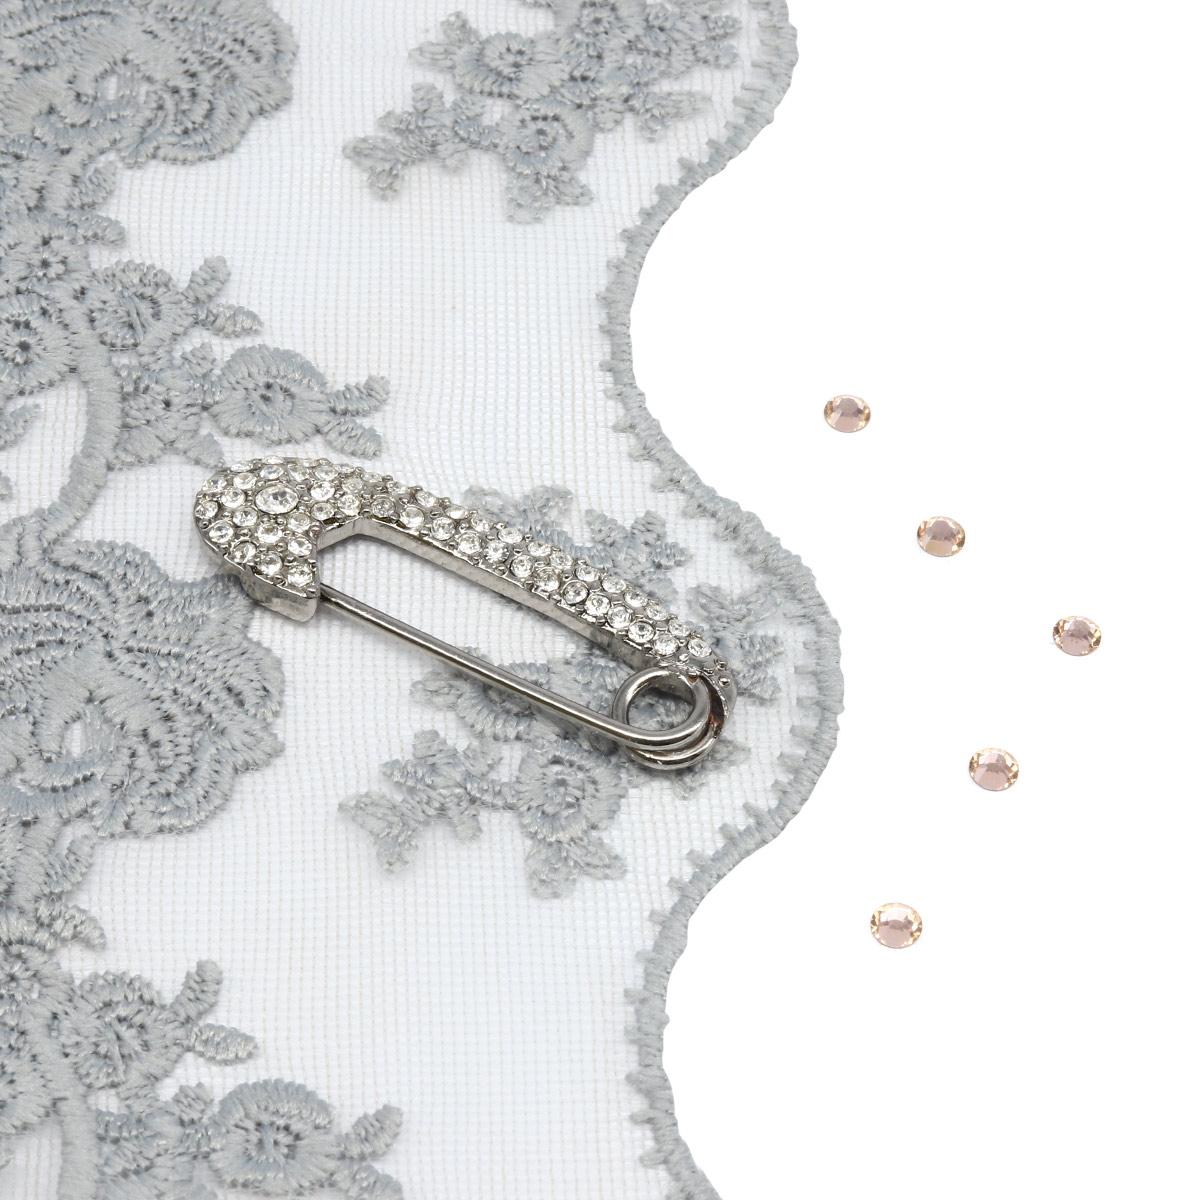 Брошь-булавка 220175, цвет #4 никель, Hobby&Pro